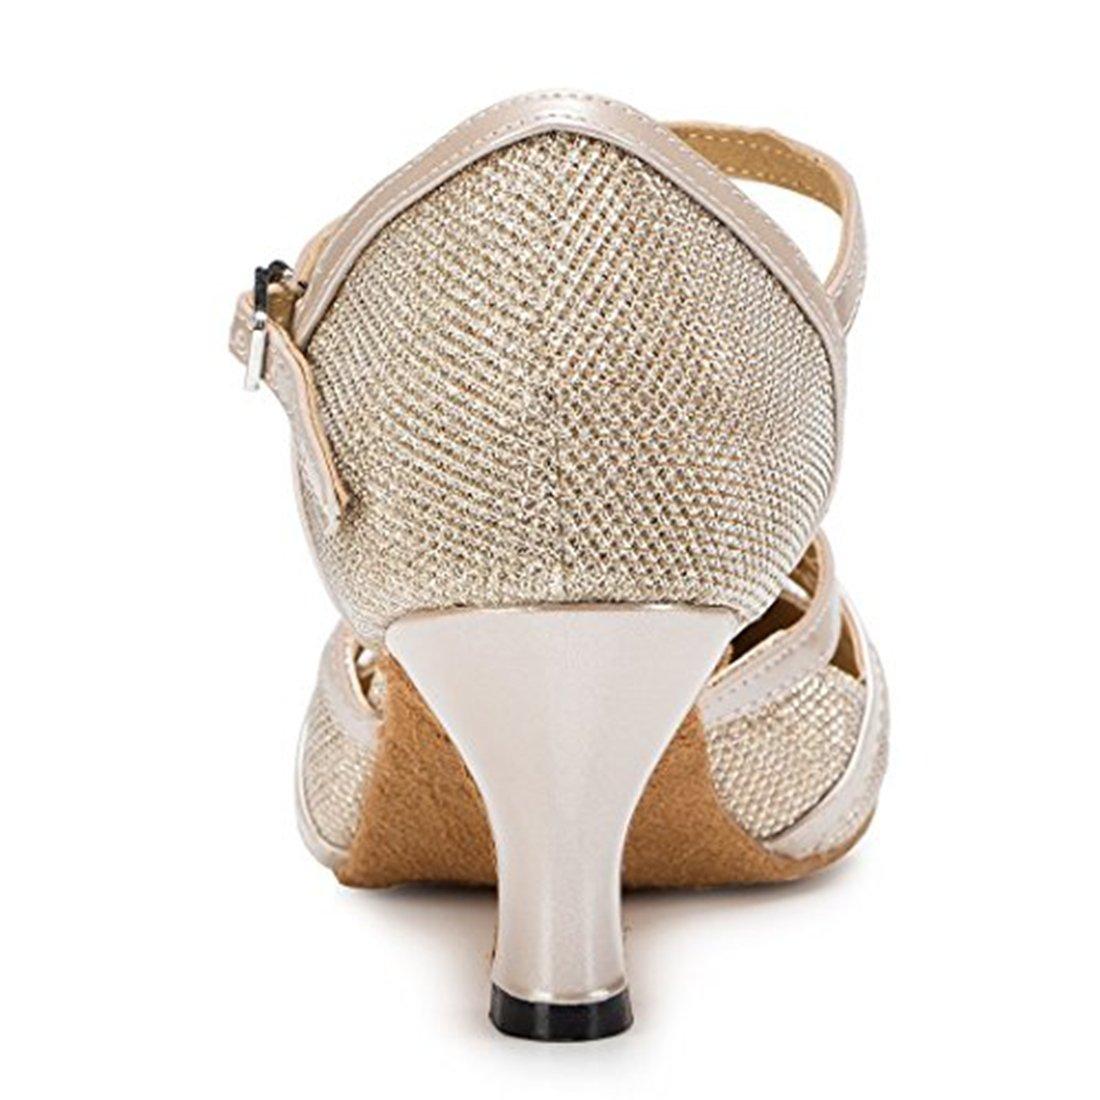 TDA Womens T-strap Glitter Synthetic Salsa Tango Ballroom Latin Party Dance Shoes CM101 B01A9T3H2E 6 B(M) US|6cm Champagne